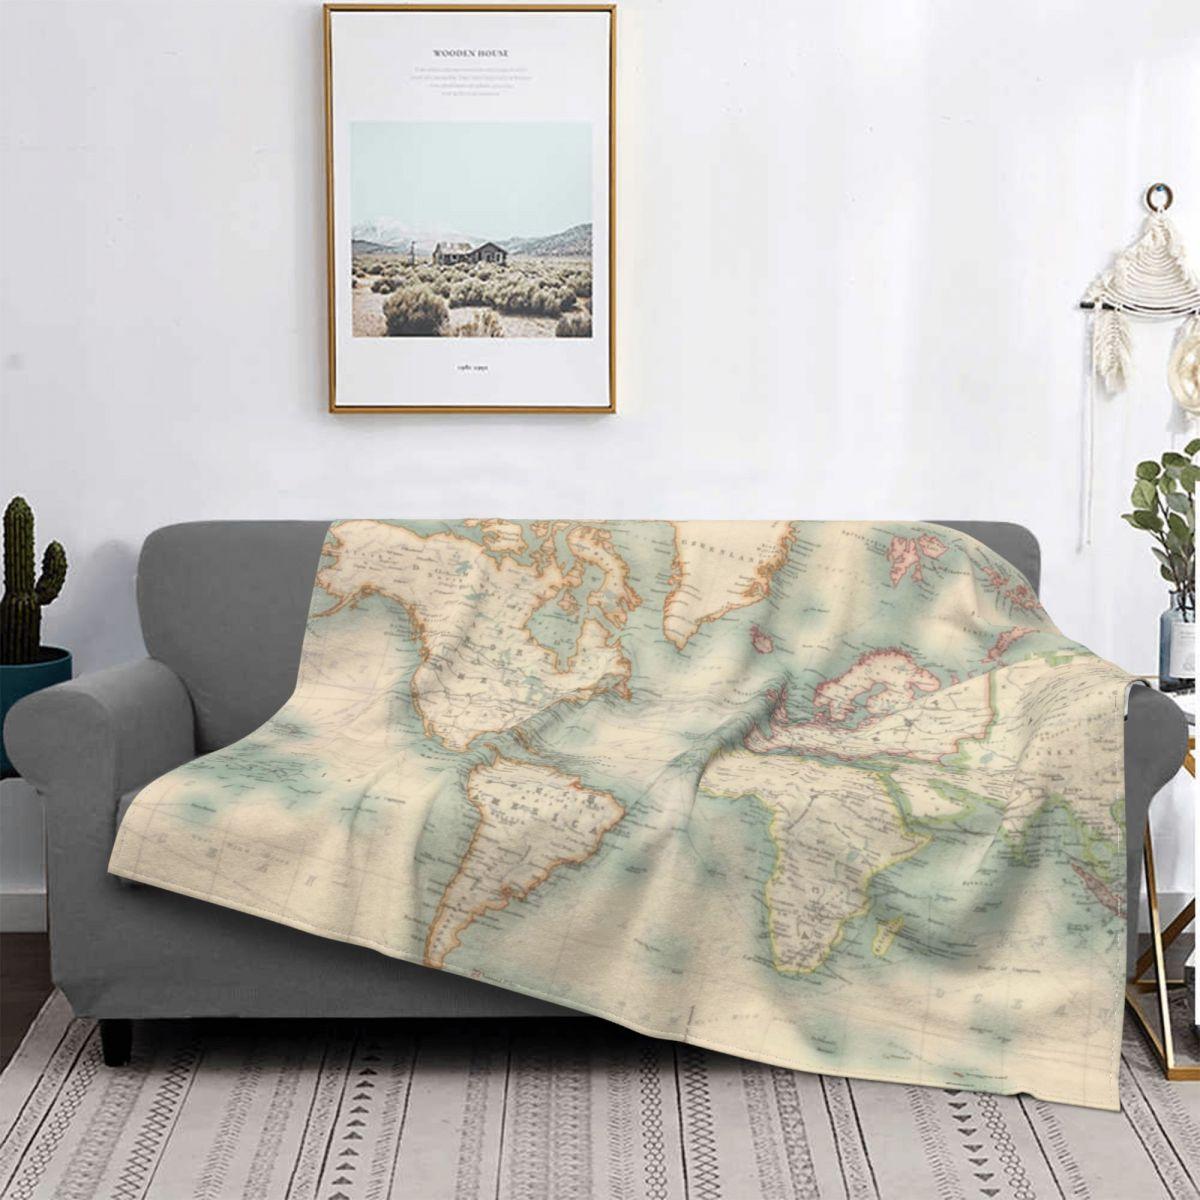 Blanket خريطة العالم 1911 خريطة العالم بطانية الصوف طباعة المحمولة سوبر الدافئة رمي بطانية للنوم غرفة نوم البساط قطعة